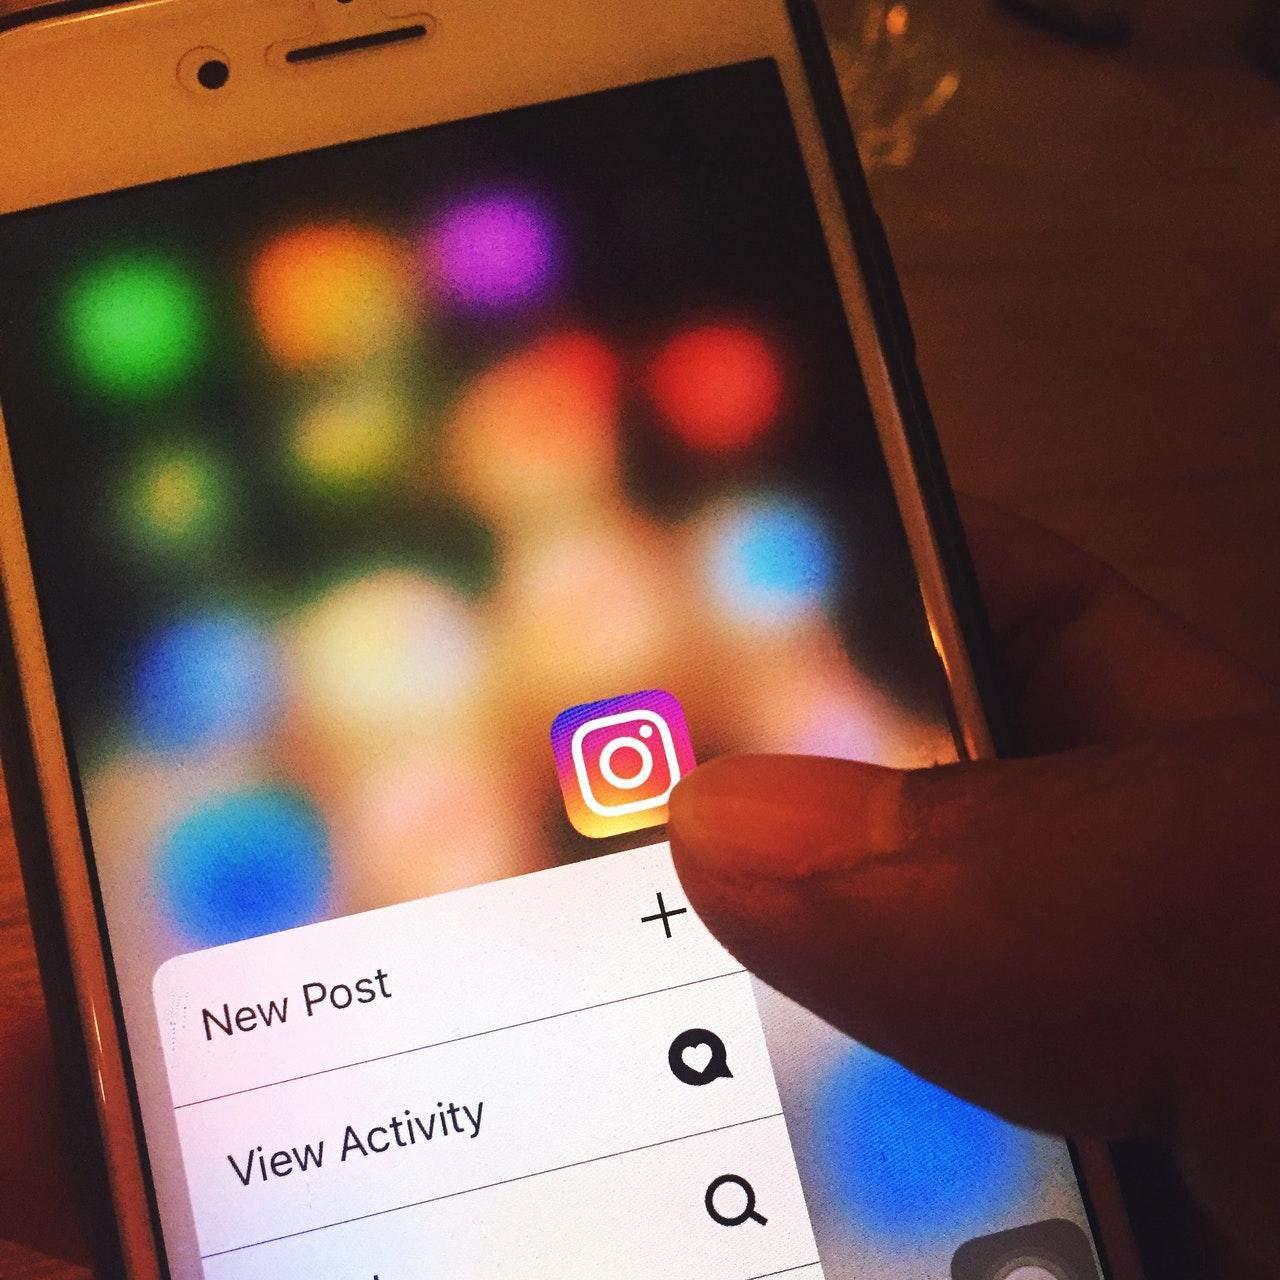 Instagram engagment